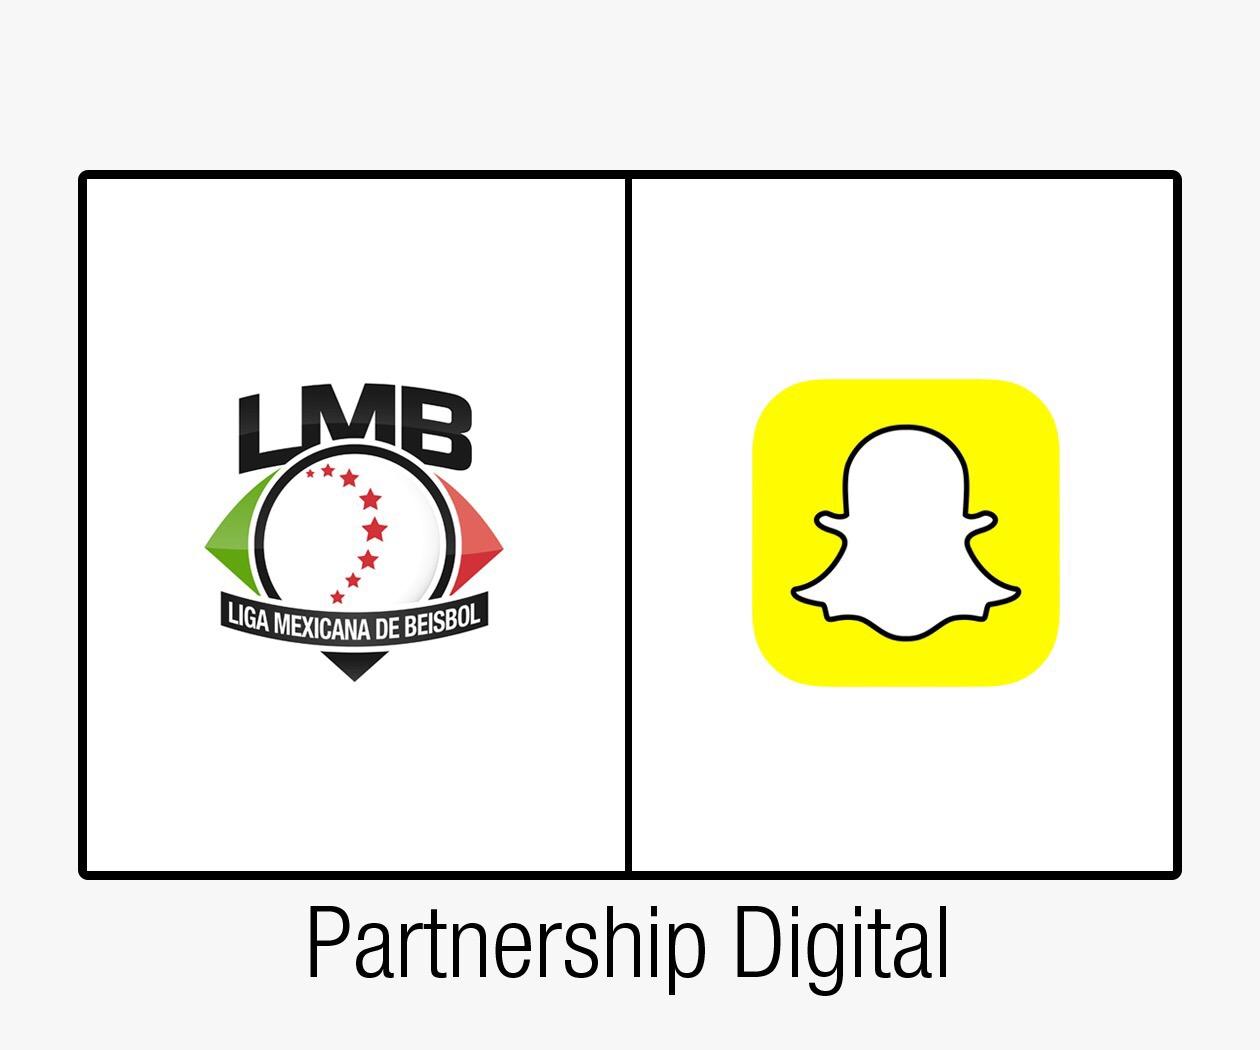 La LMB hace alianza con Snapchat